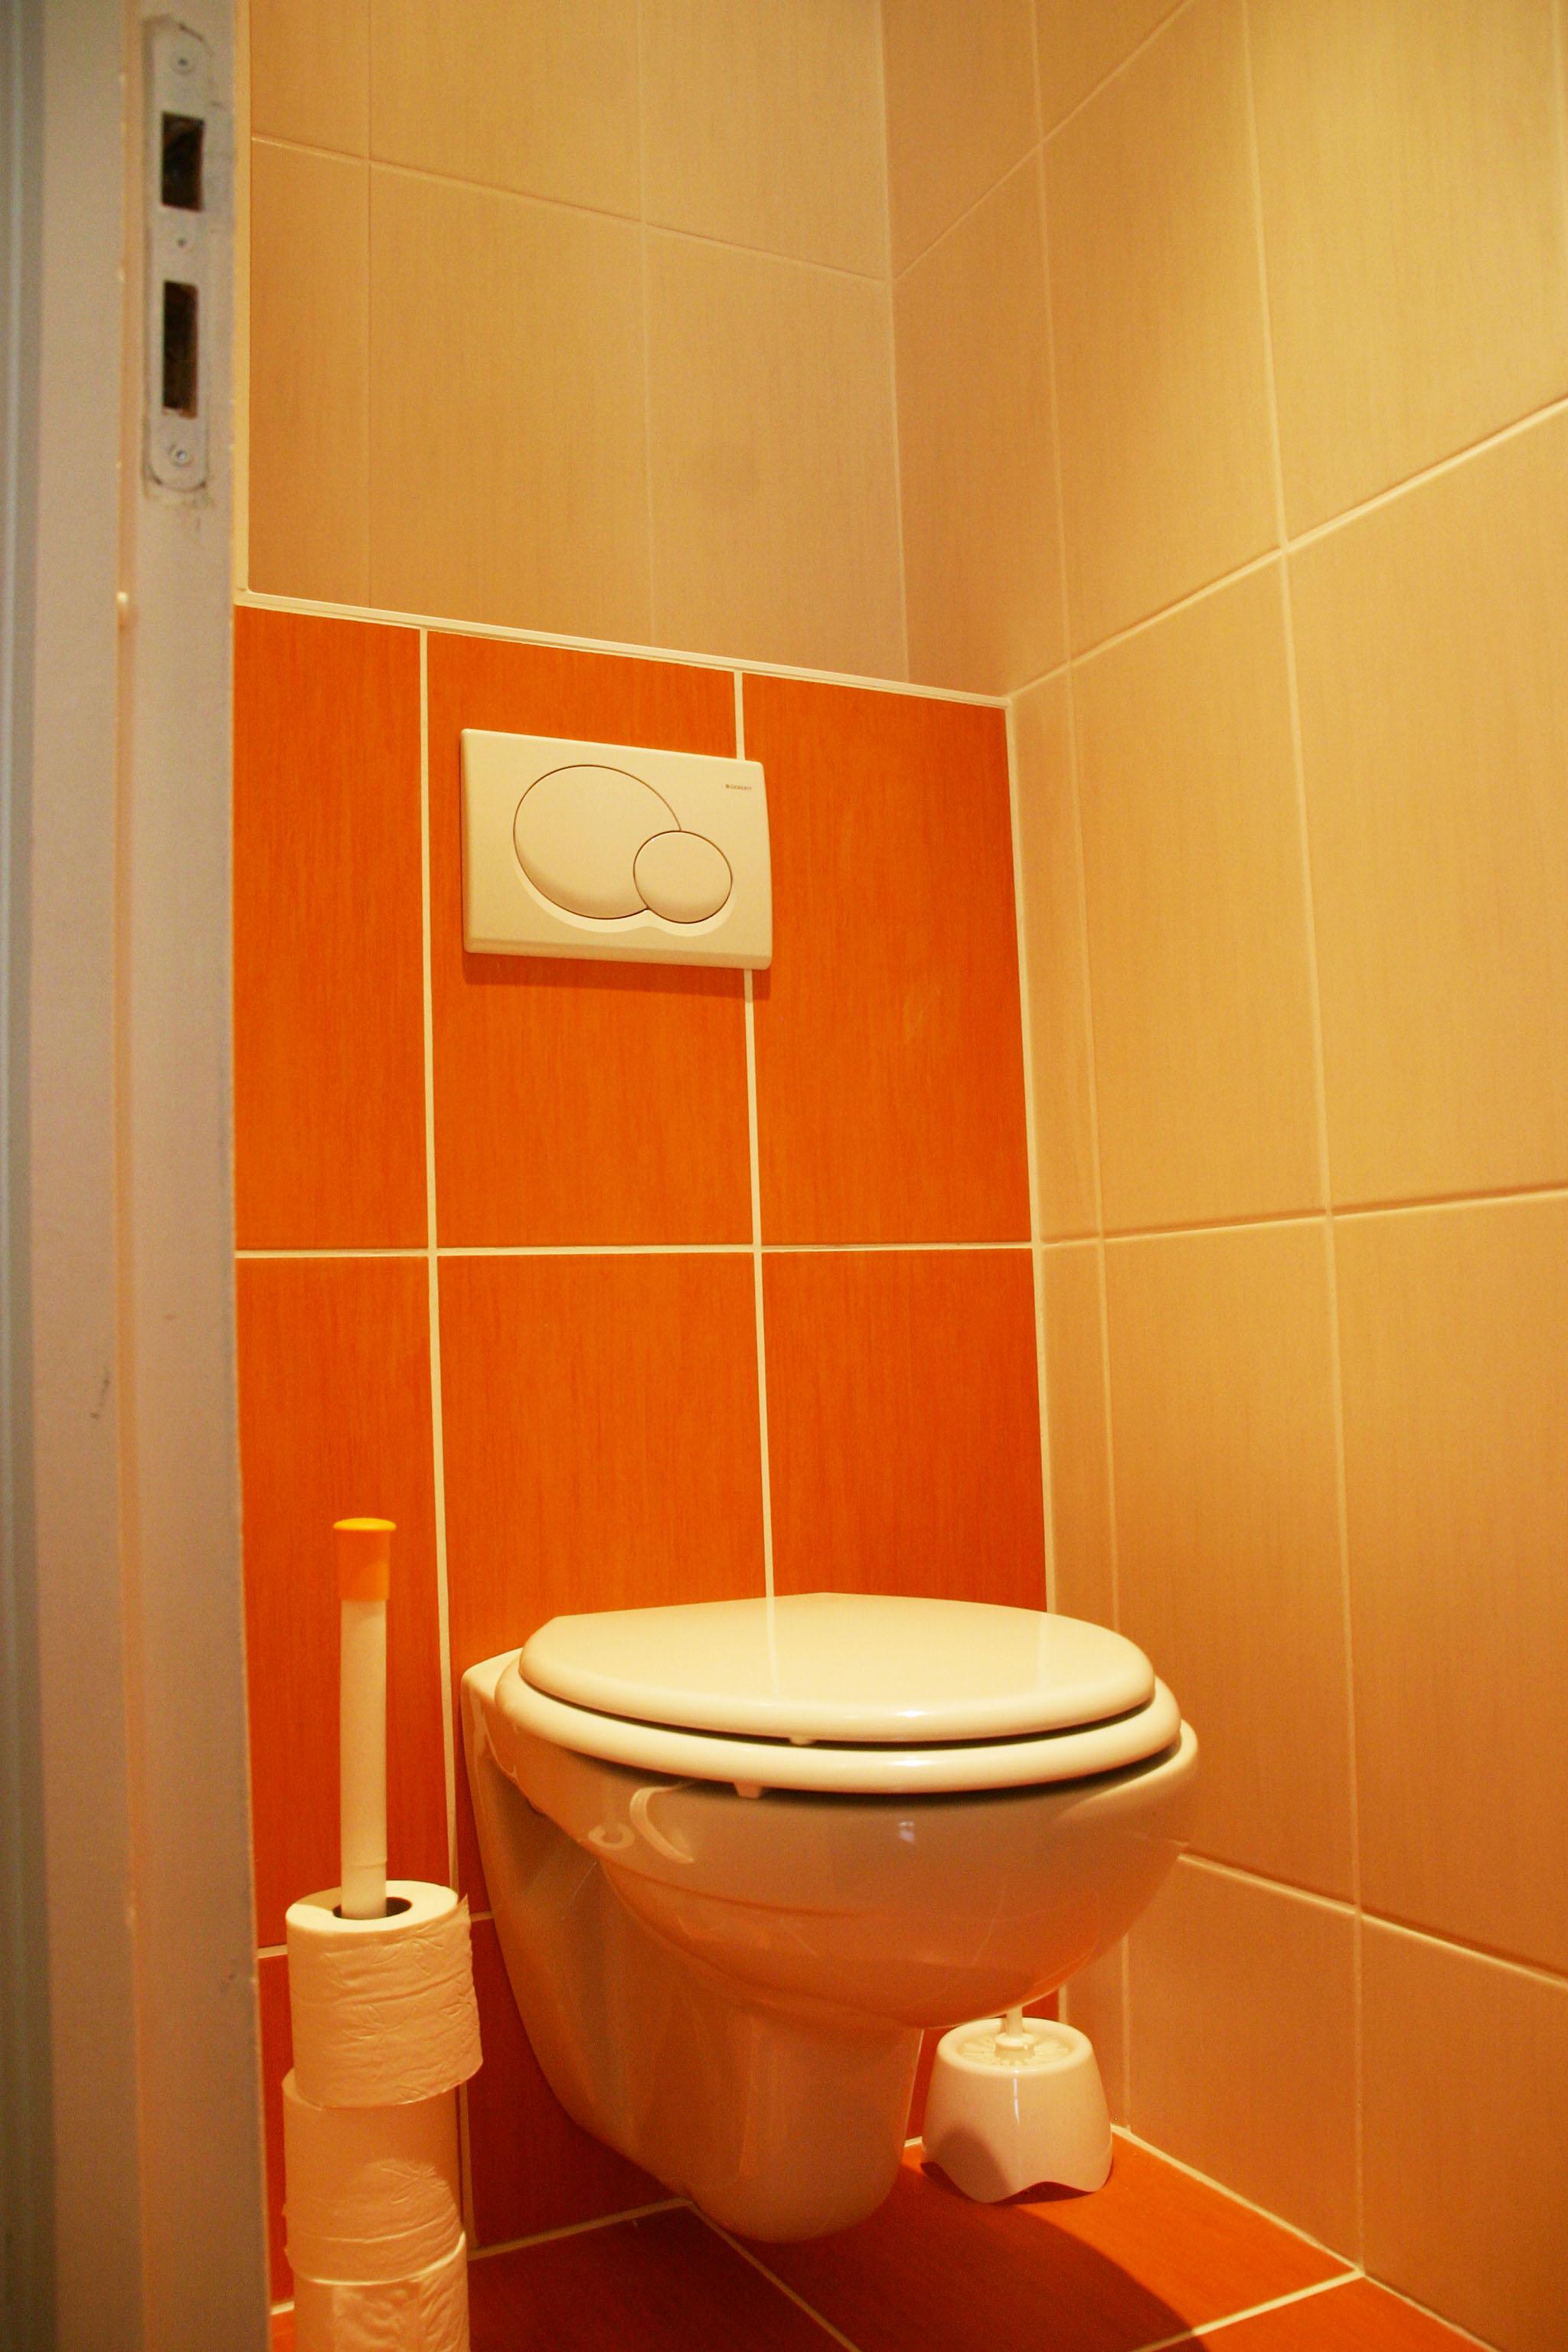 Restaurer salle de bain interesting travaux de rnovation de salle de sur grenoble regarding - Restaurer une salle de bain ...